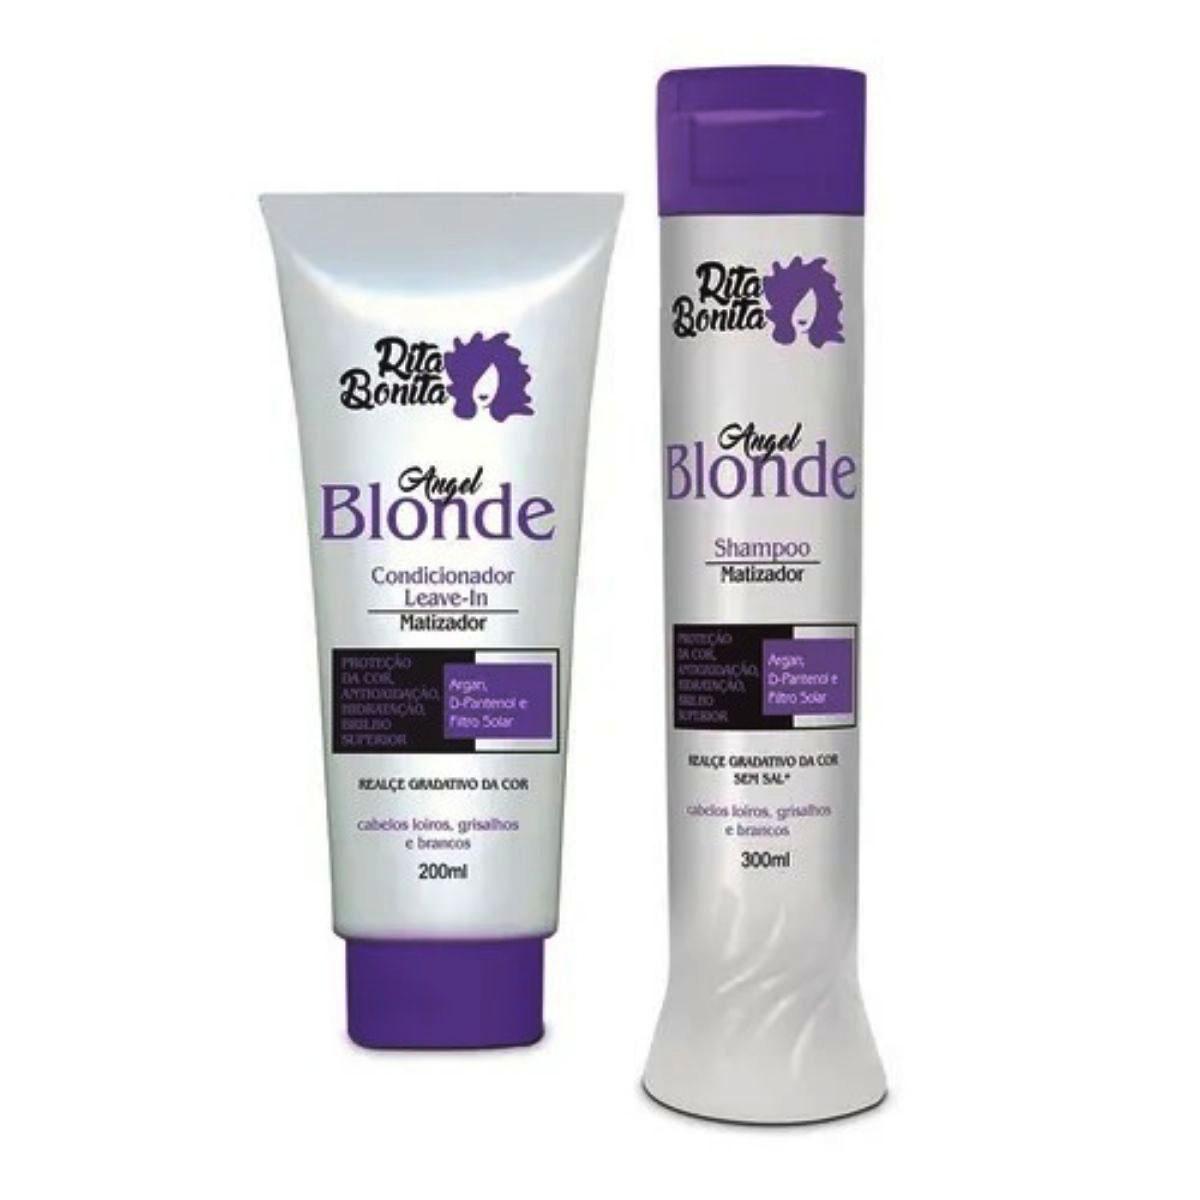 Angel Blonde - Kit Rita Bonita  Duo Home Care (2 Produtos)